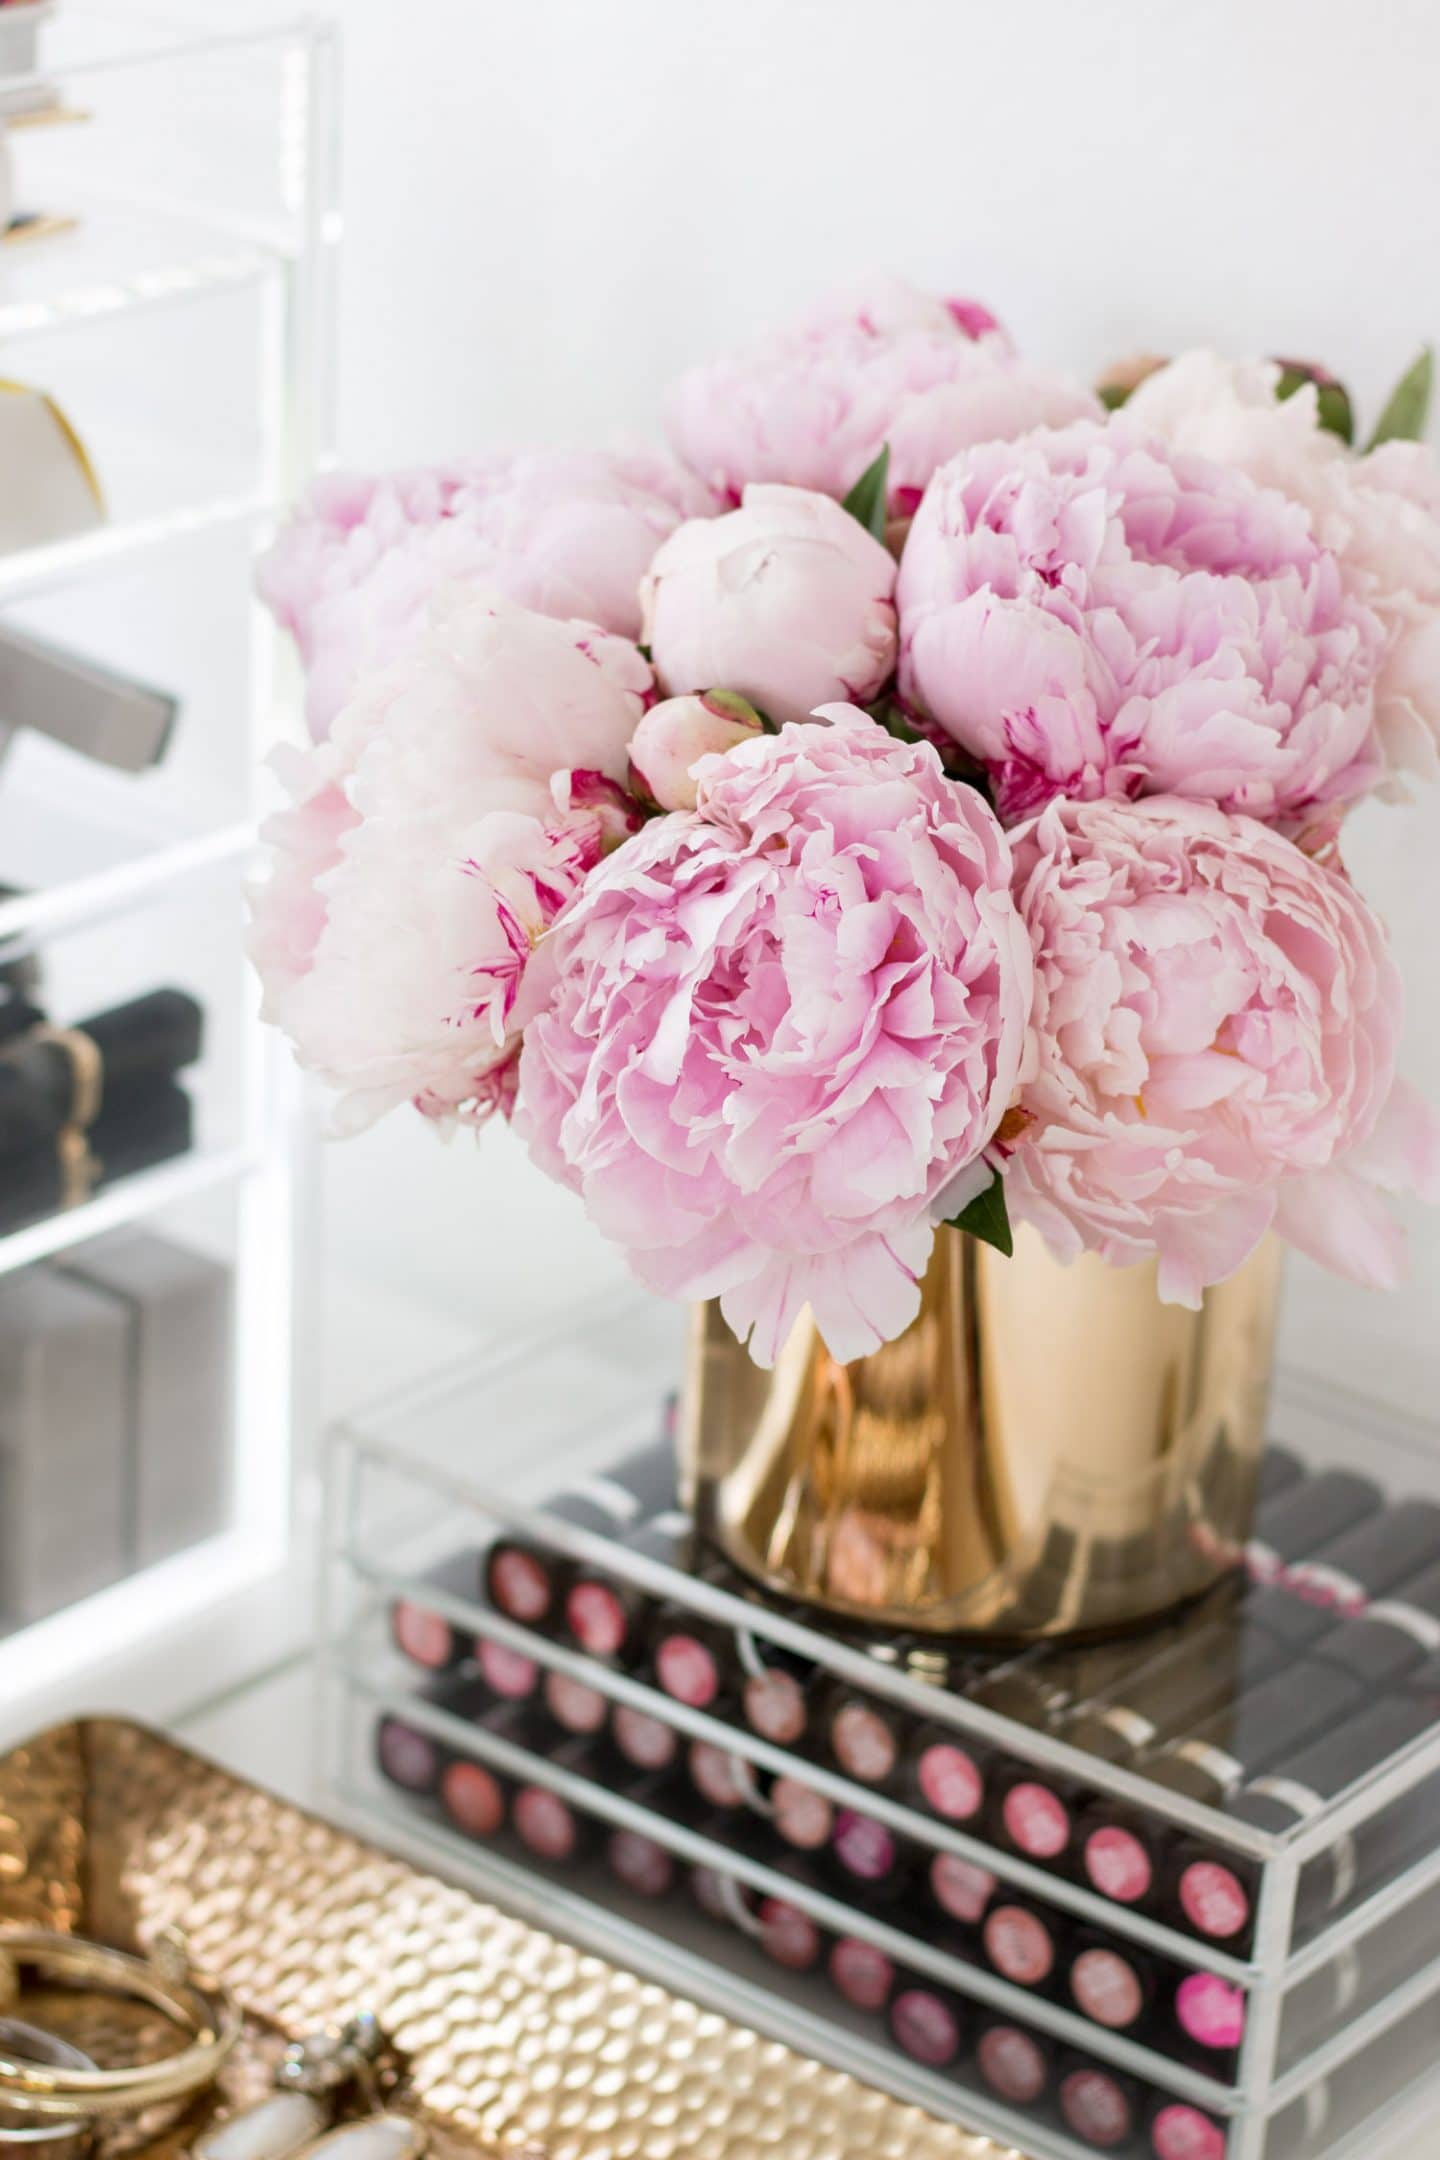 valspar home office tour ashley brooke nicholas cute office inspiration target style flowers makeup